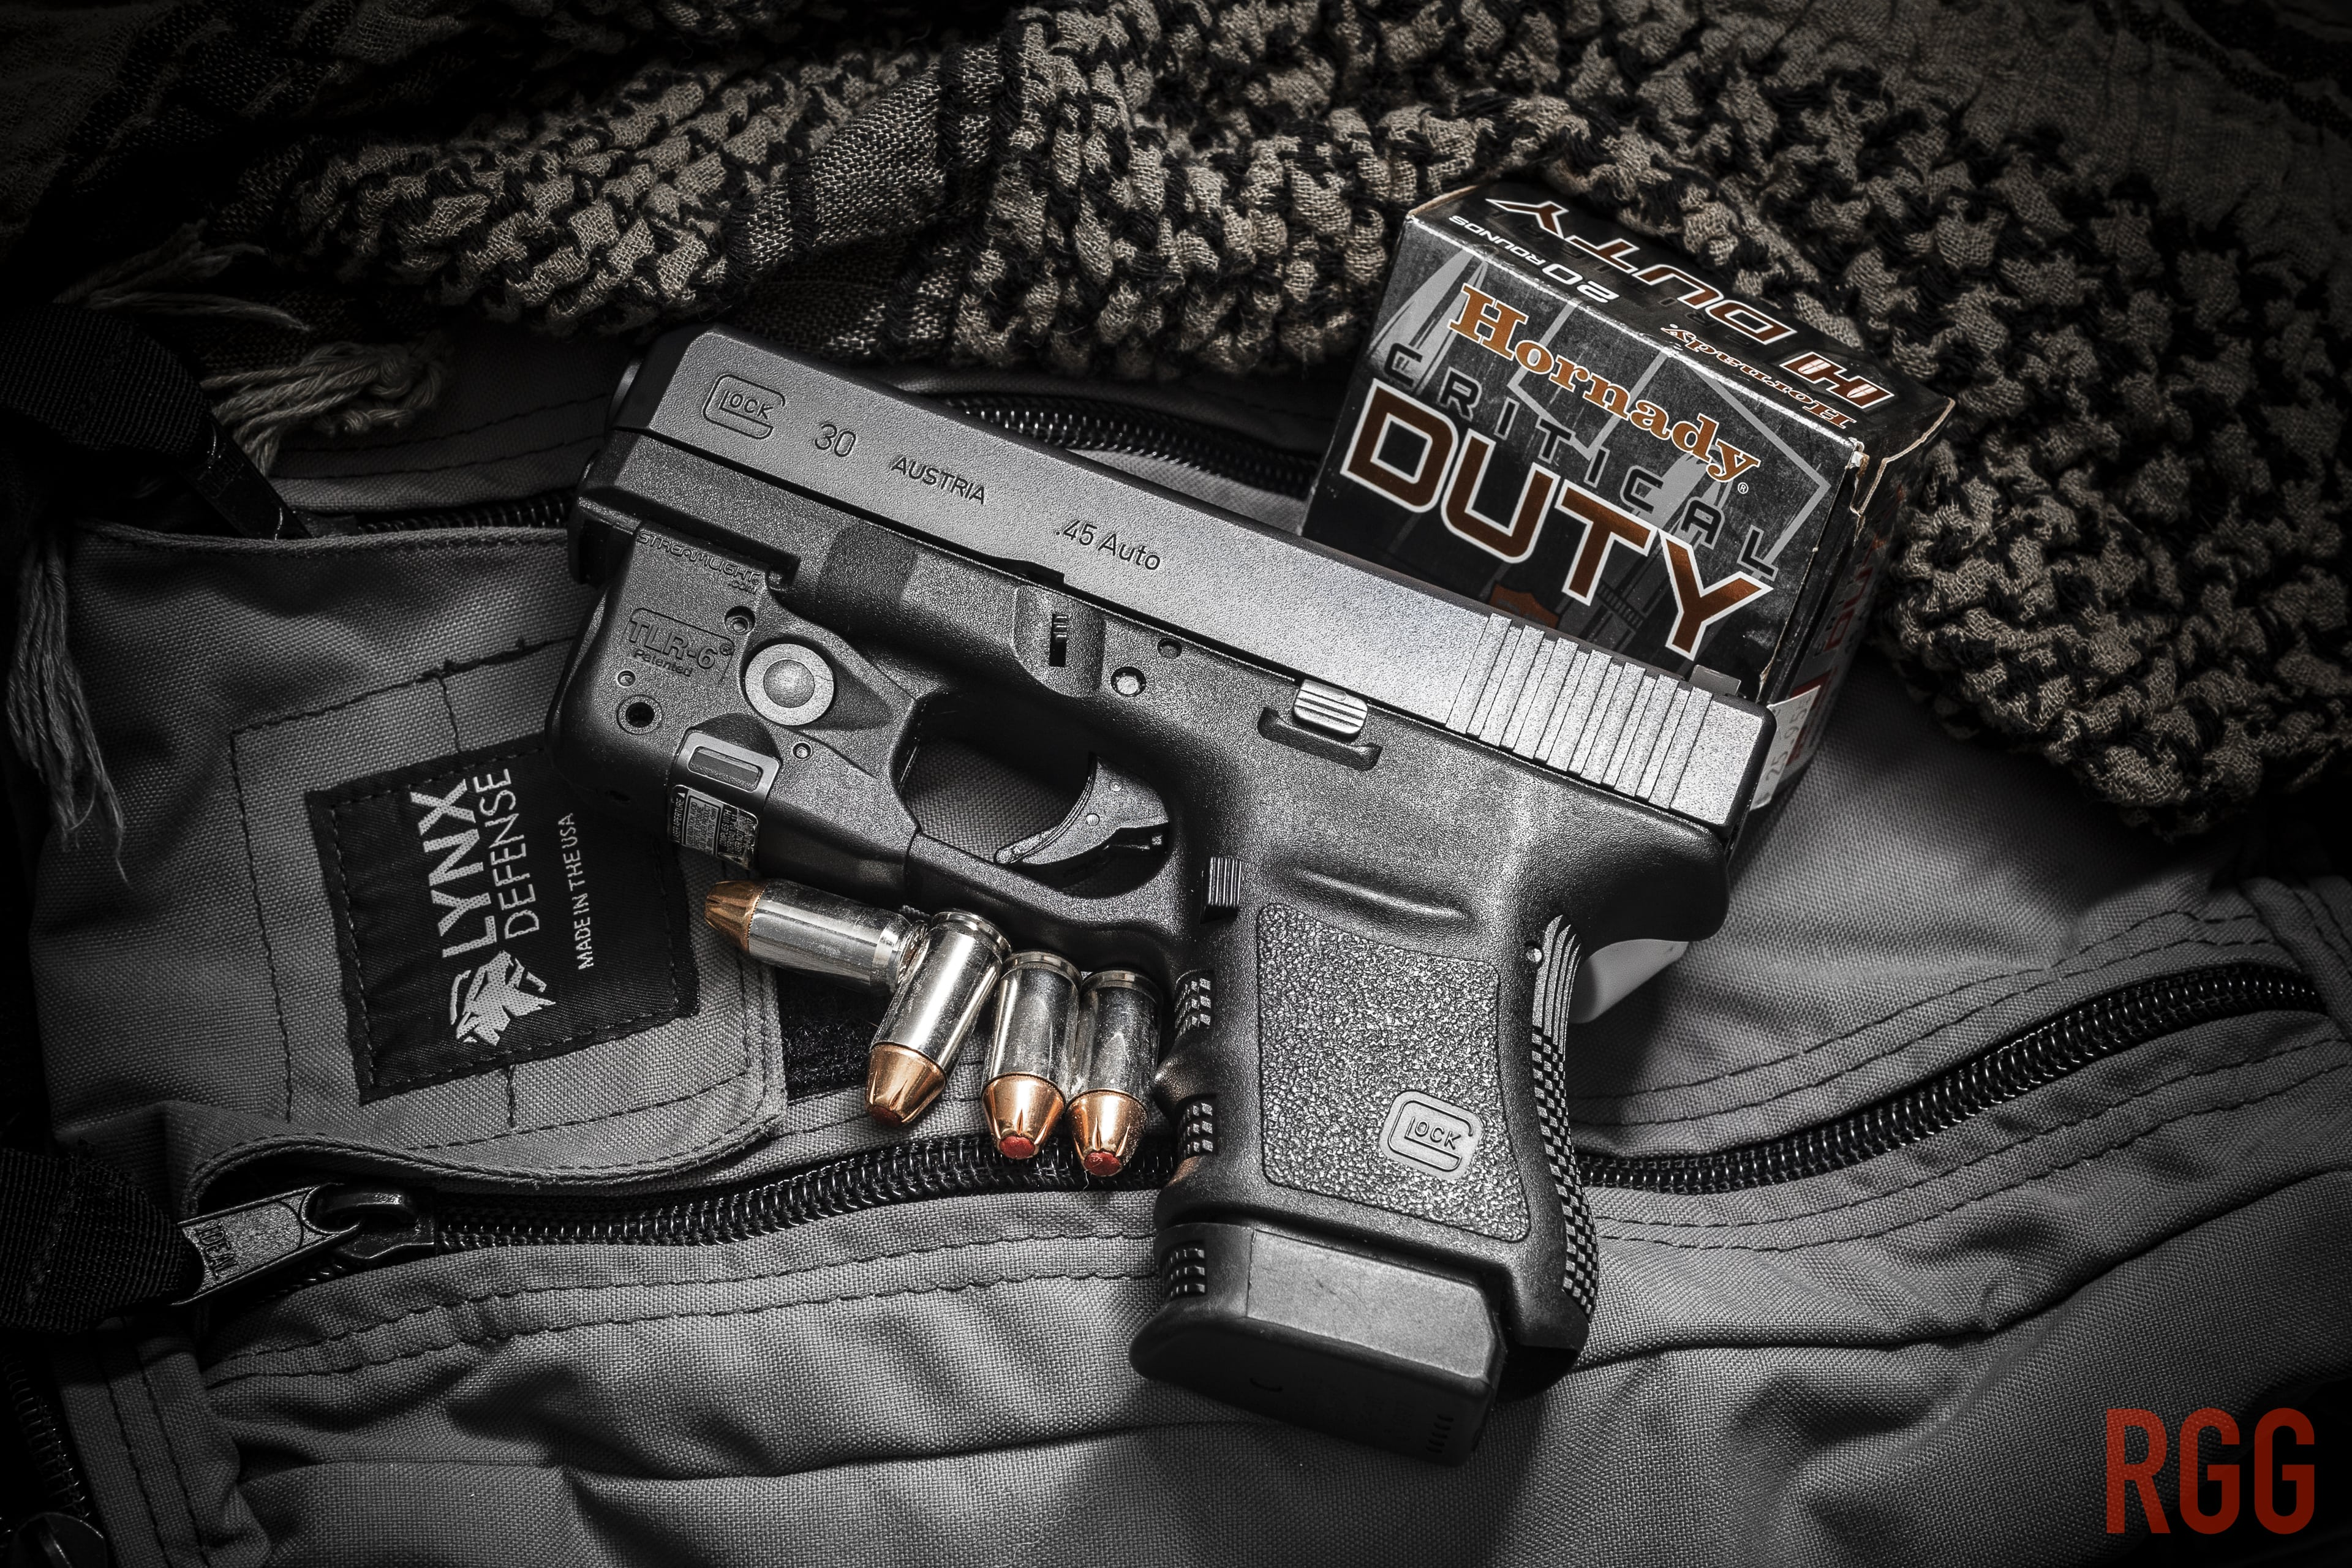 A GLOCK 30 .45 ACP pistol and the Lynx Pistol Range Bag.